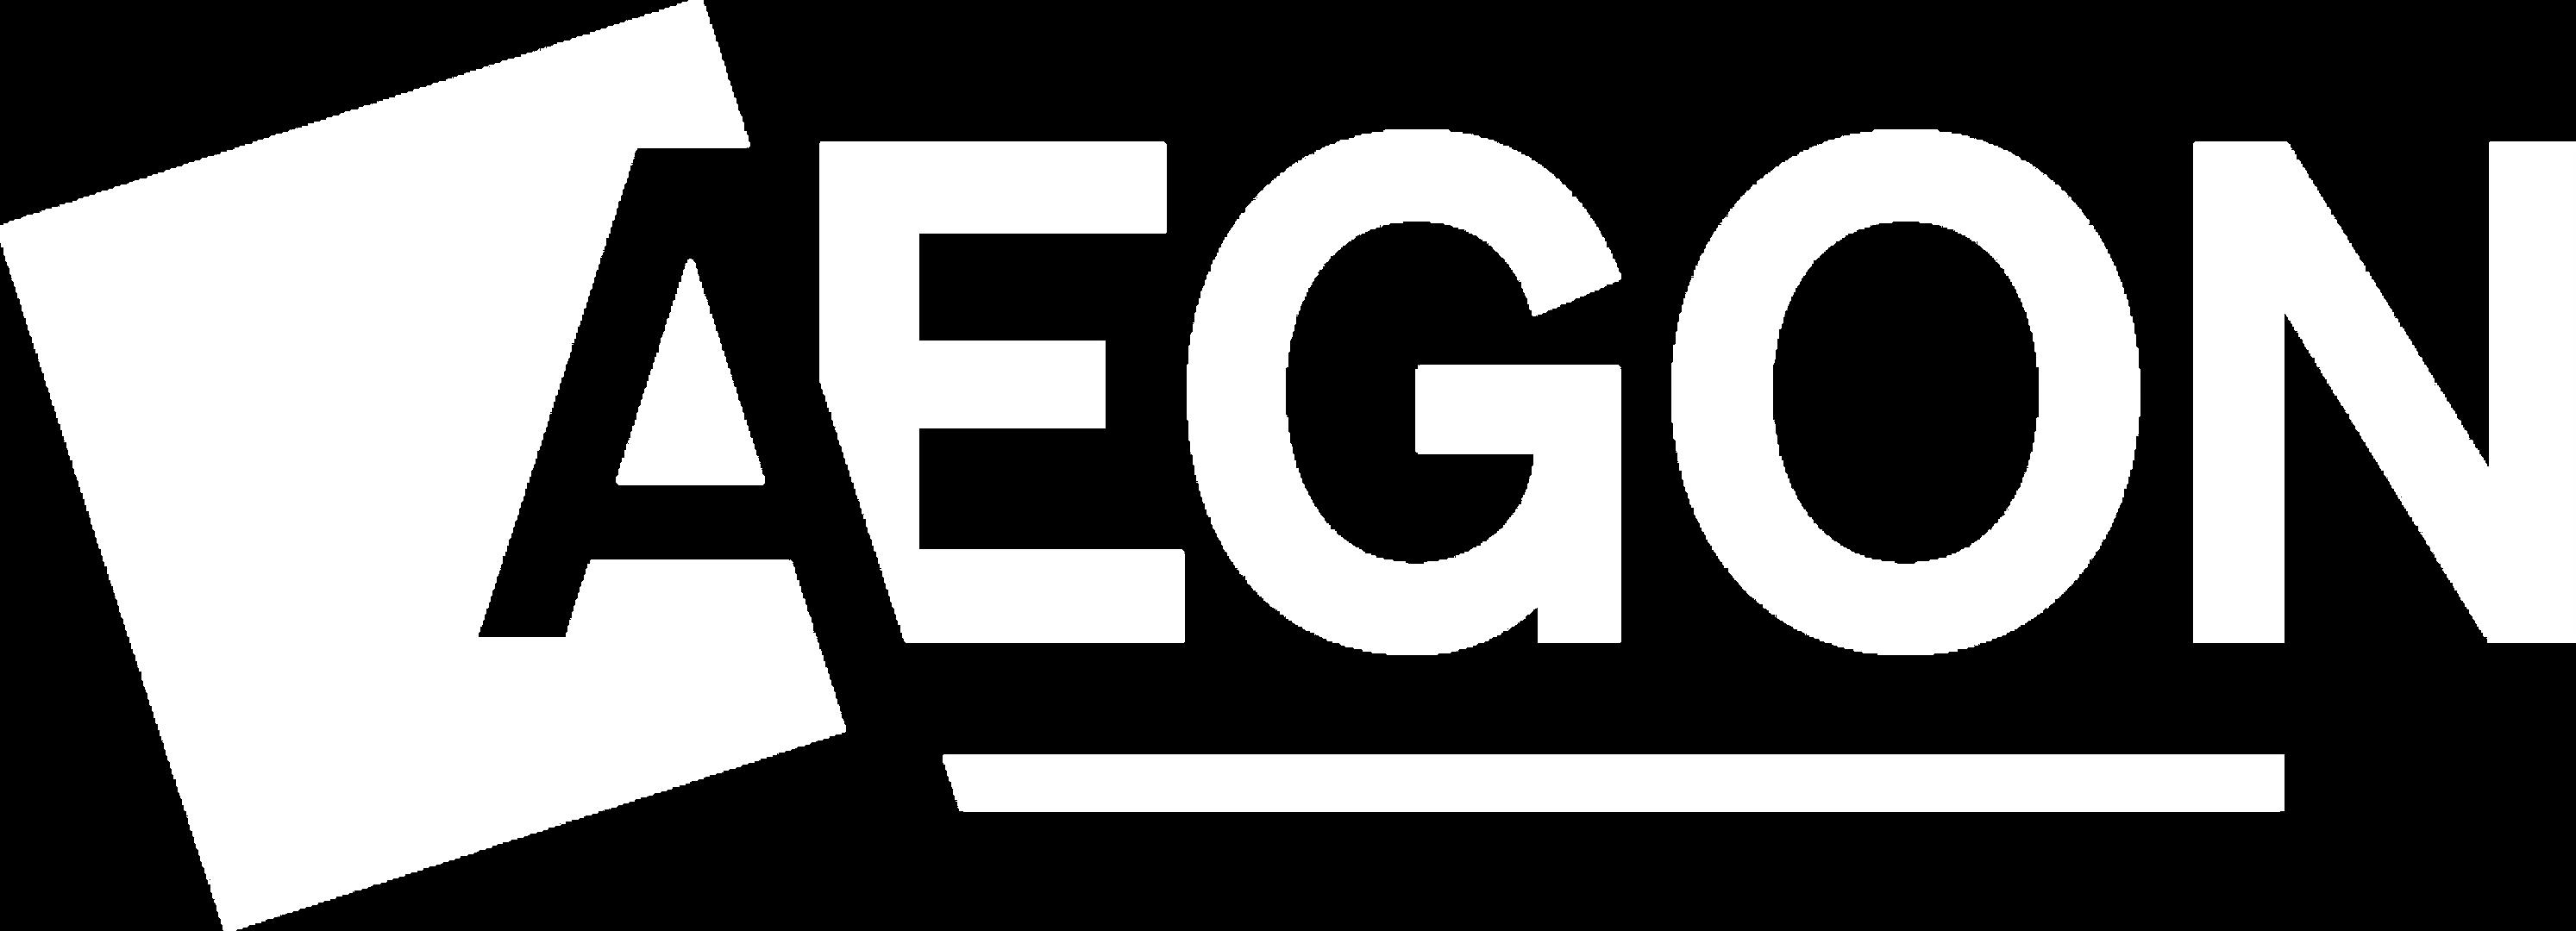 white-AEGON_(logo).png